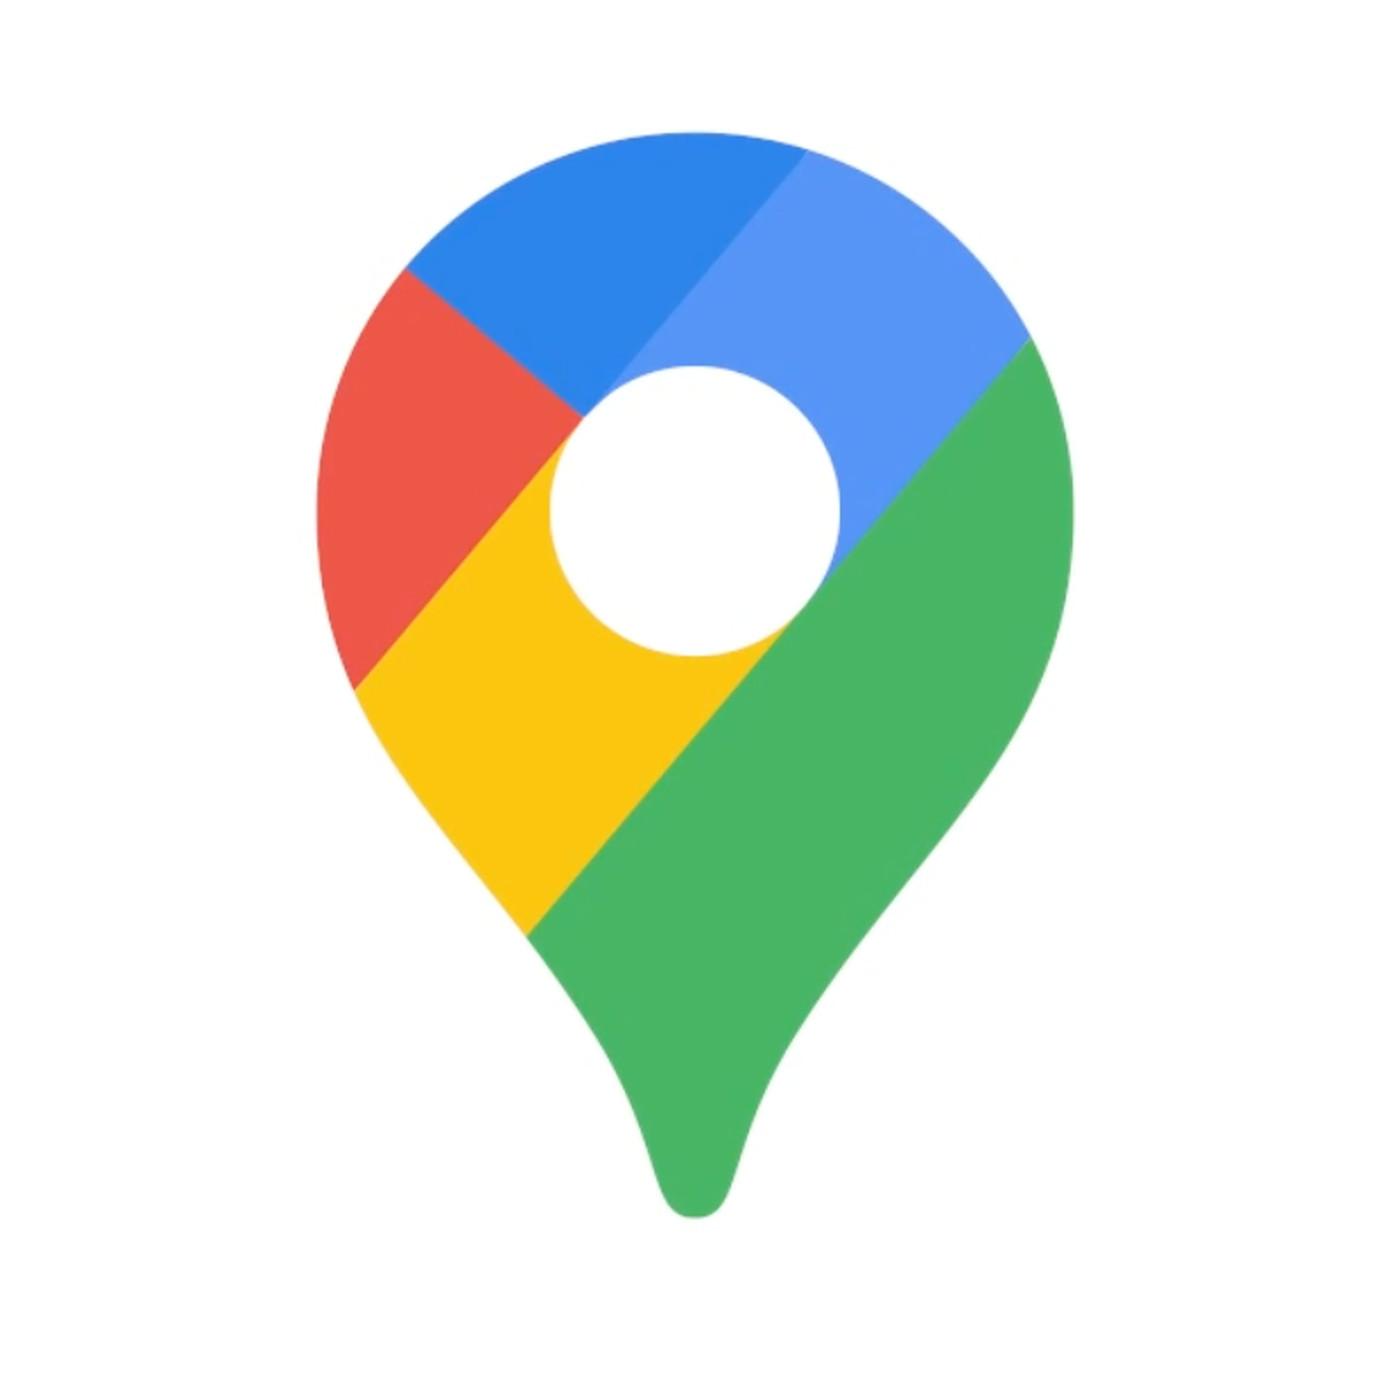 The Google Maps logo